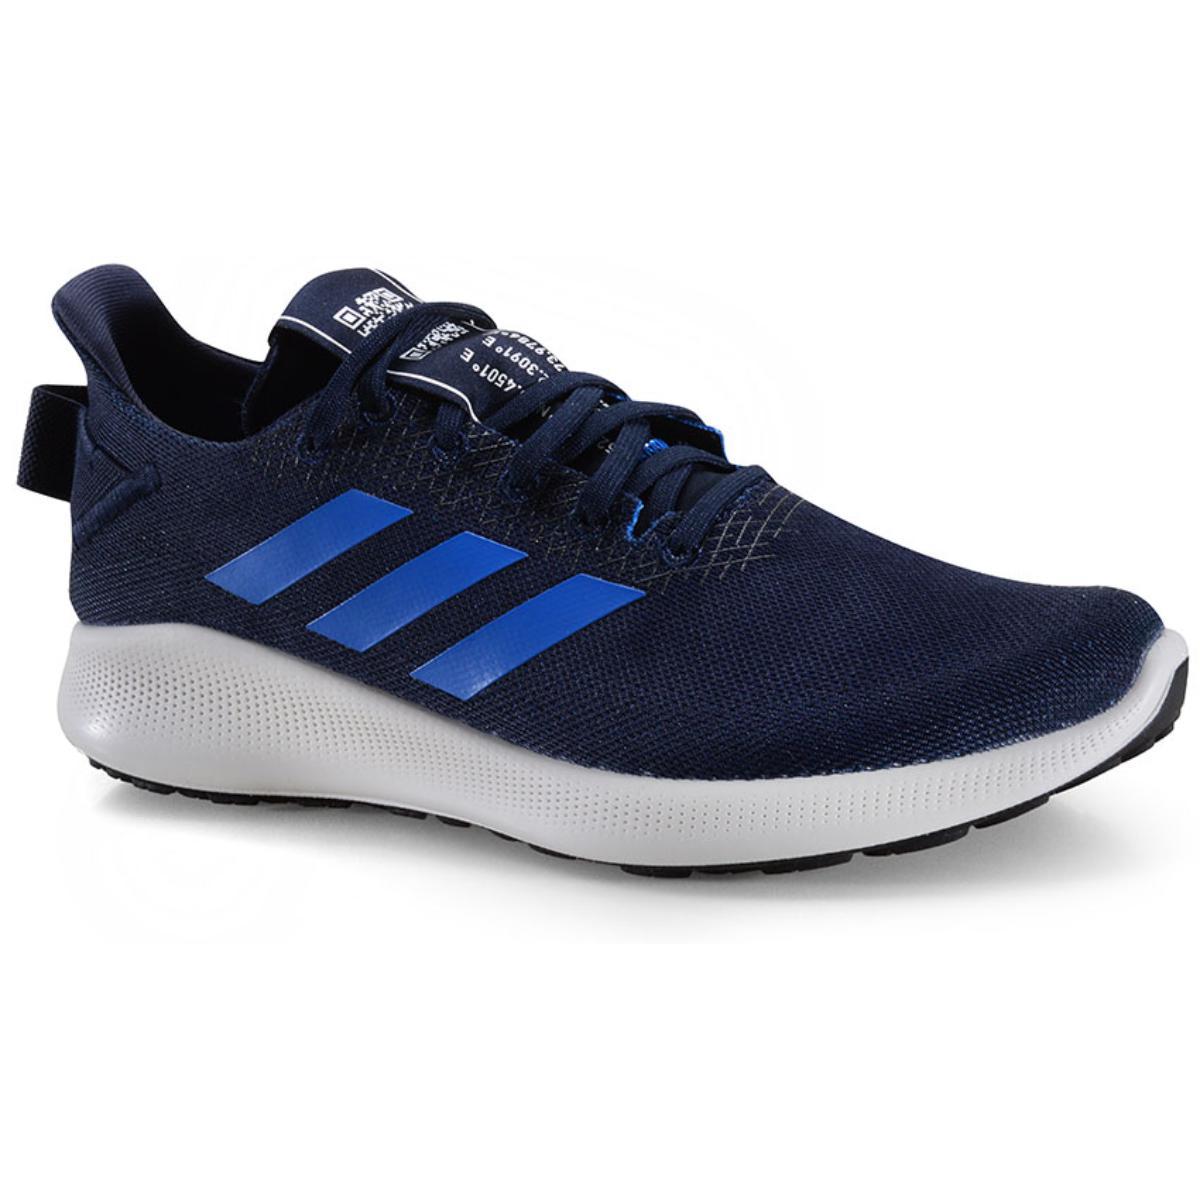 Tênis Masculino Adidas Eg1031 Sensebounce Street m Marinho/azul